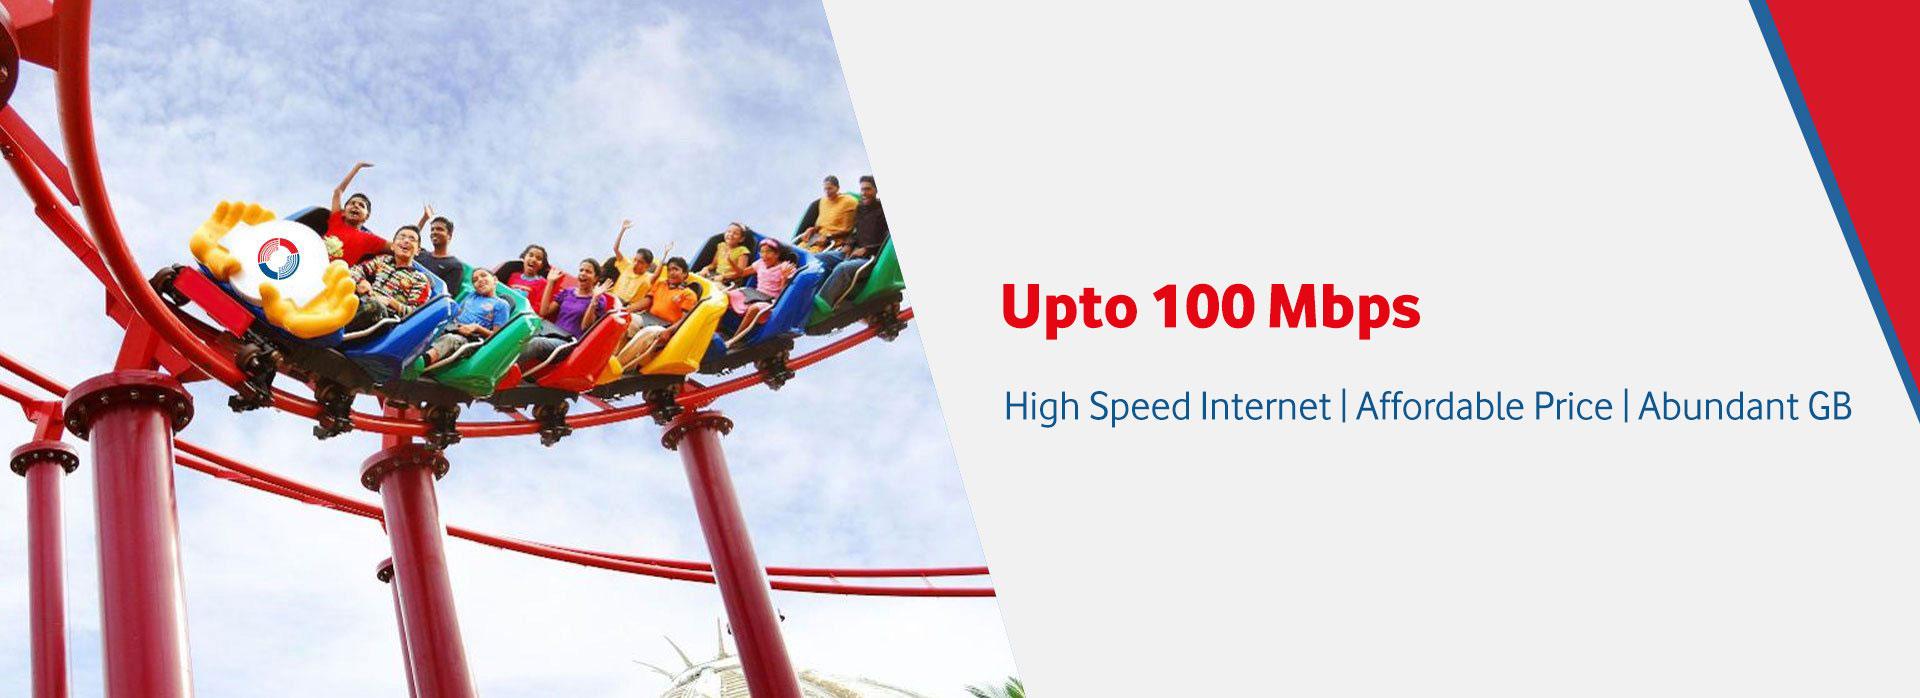 Fast broadband in bangalore dating 2